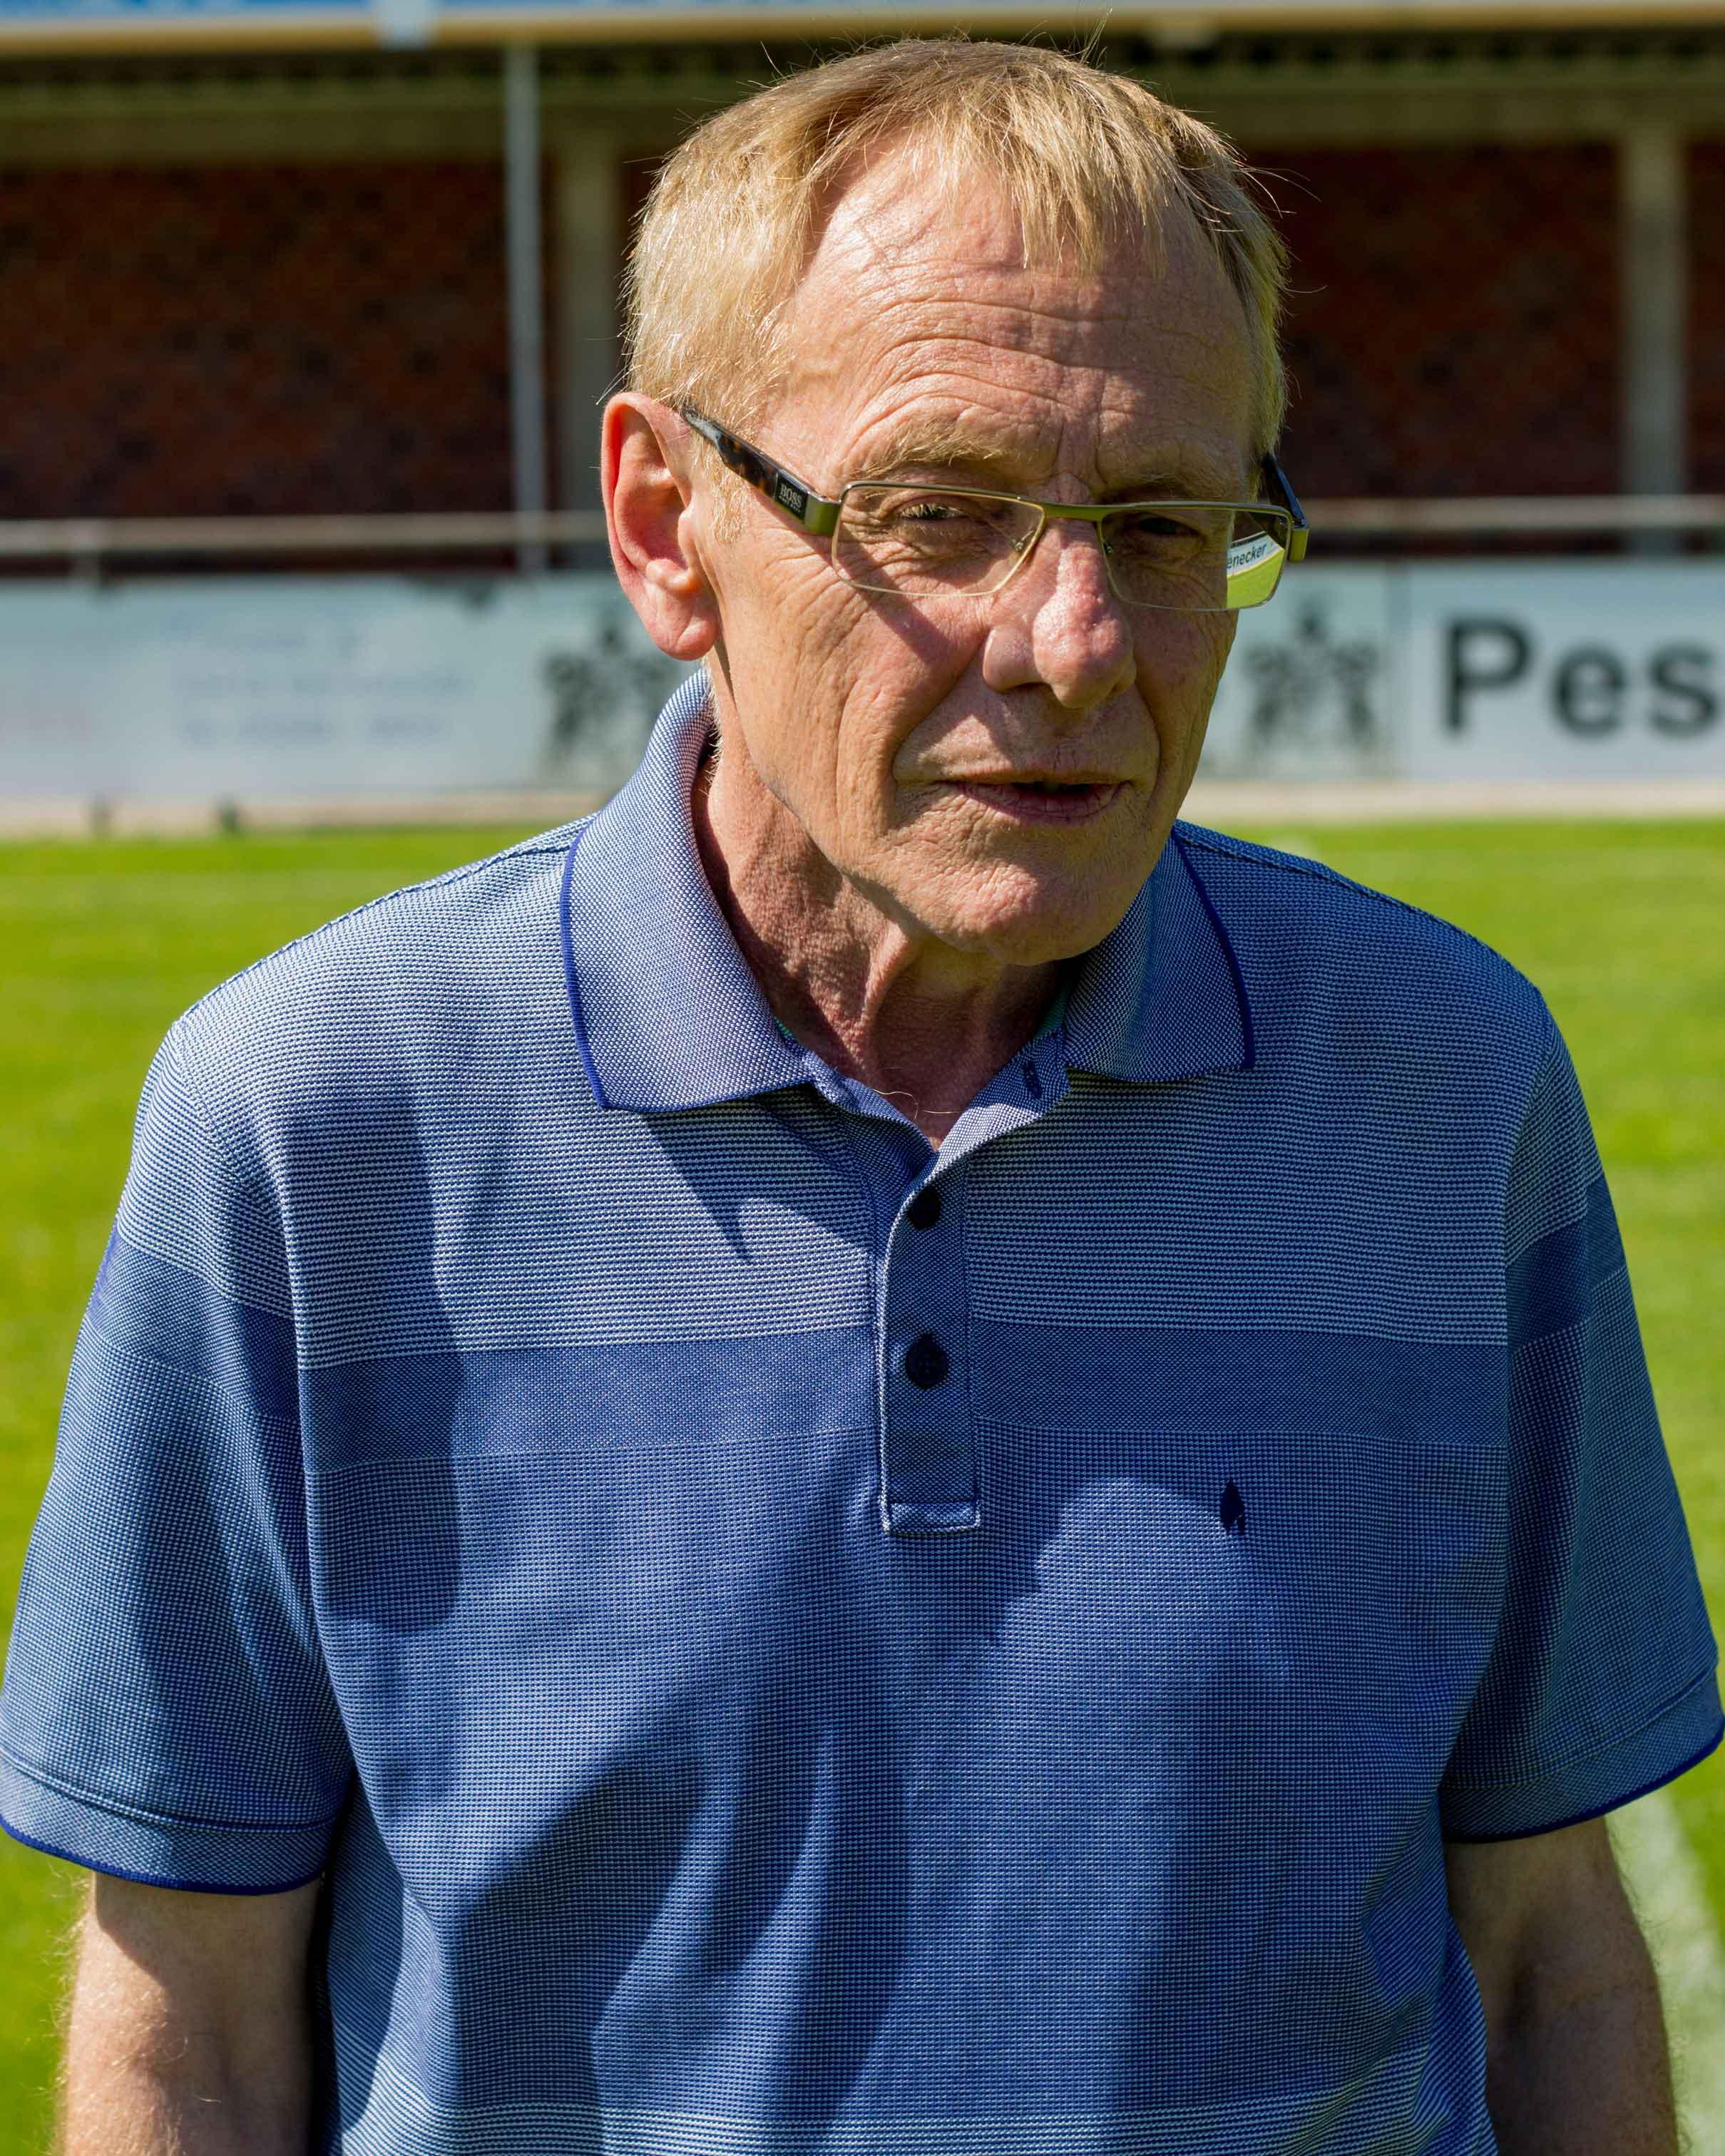 Klaus Moselage